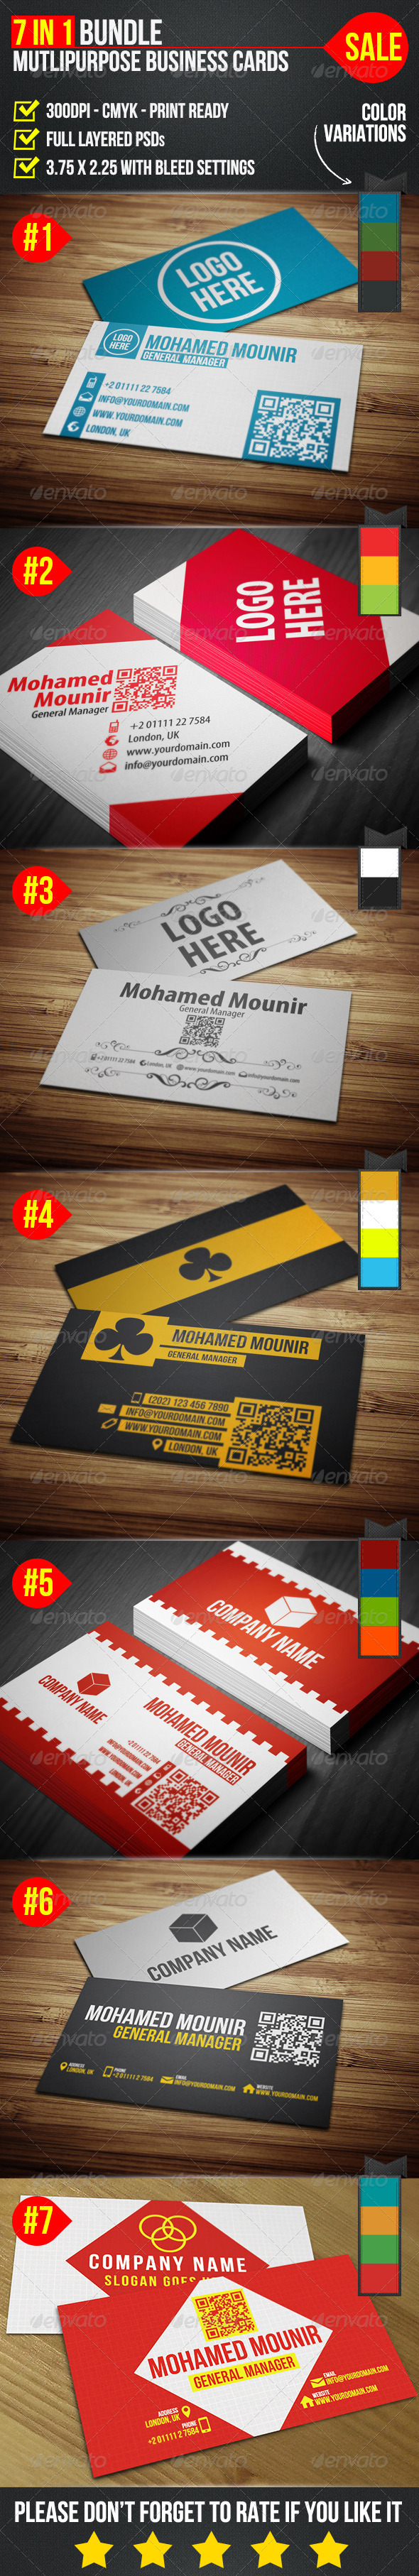 Multipurpose Business Cards Bundle - Business Cards Print Templates